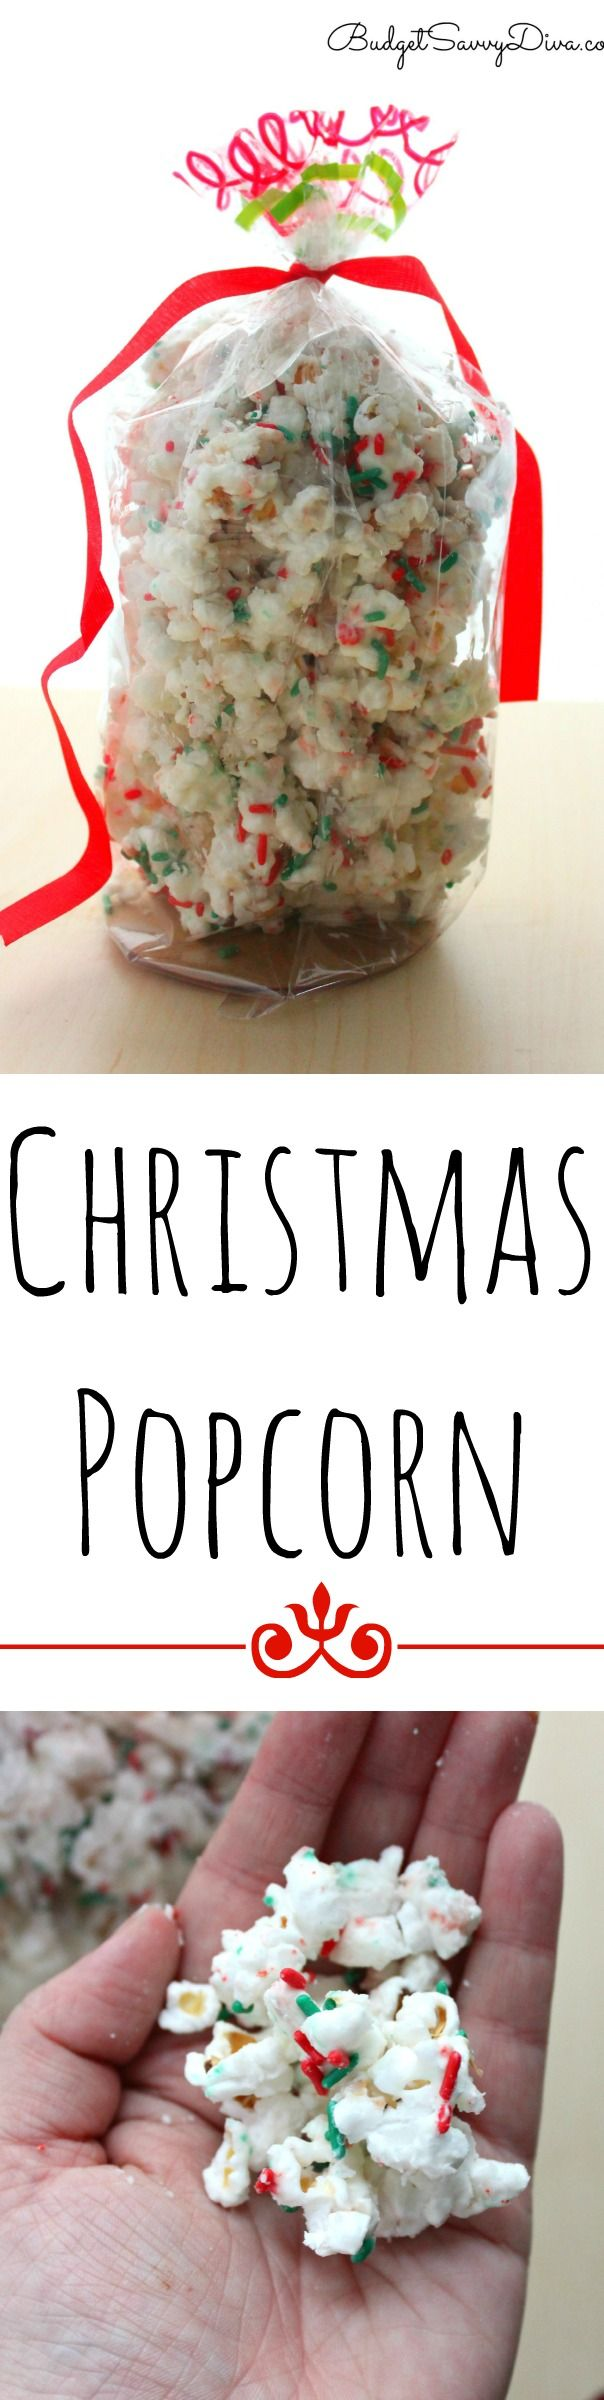 Christmas Popcorn Recipe                                                                                                                                                                                 More